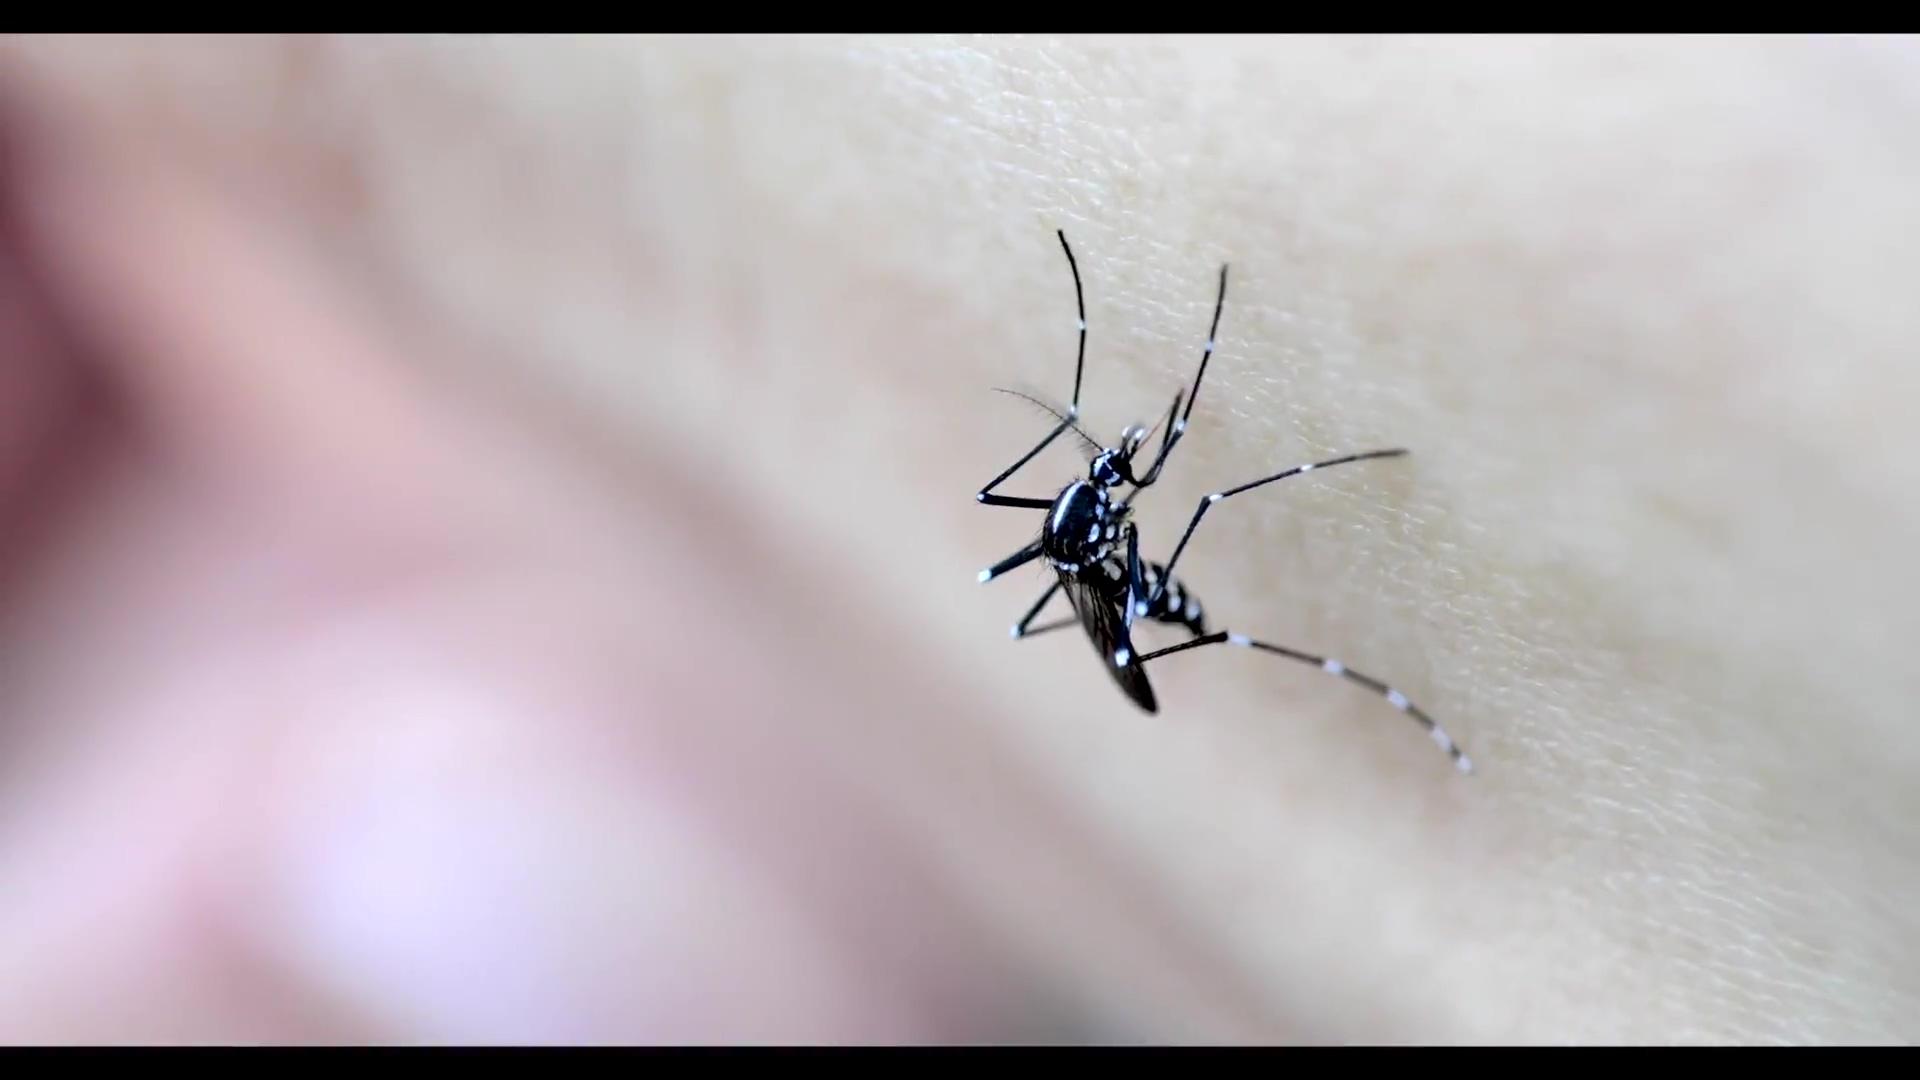 Kingstowne Pest Control - no CTA or music